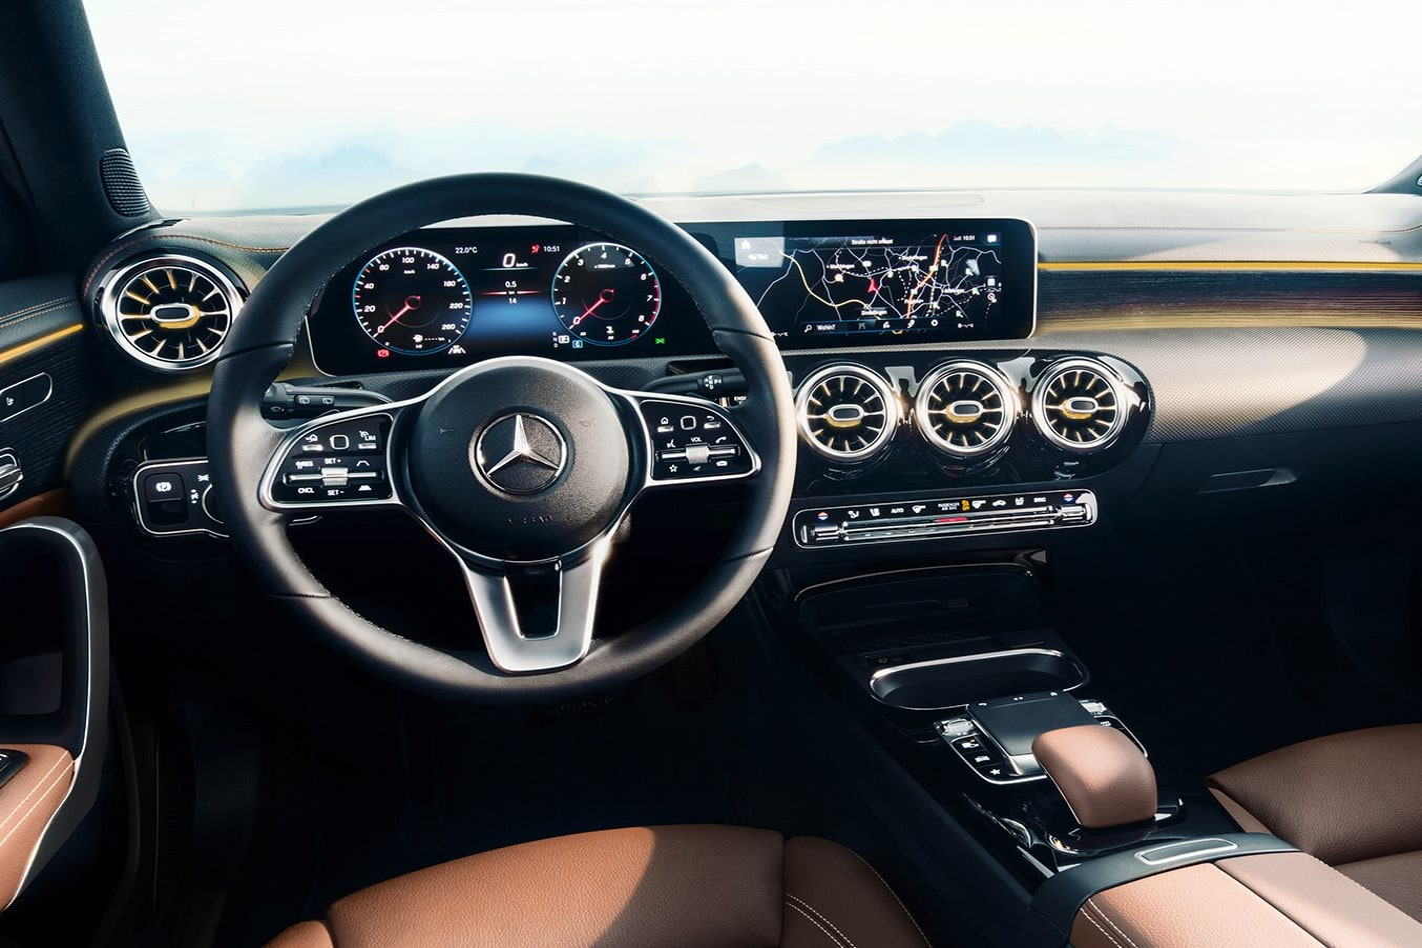 2018 Mercedes Benz A Class interior